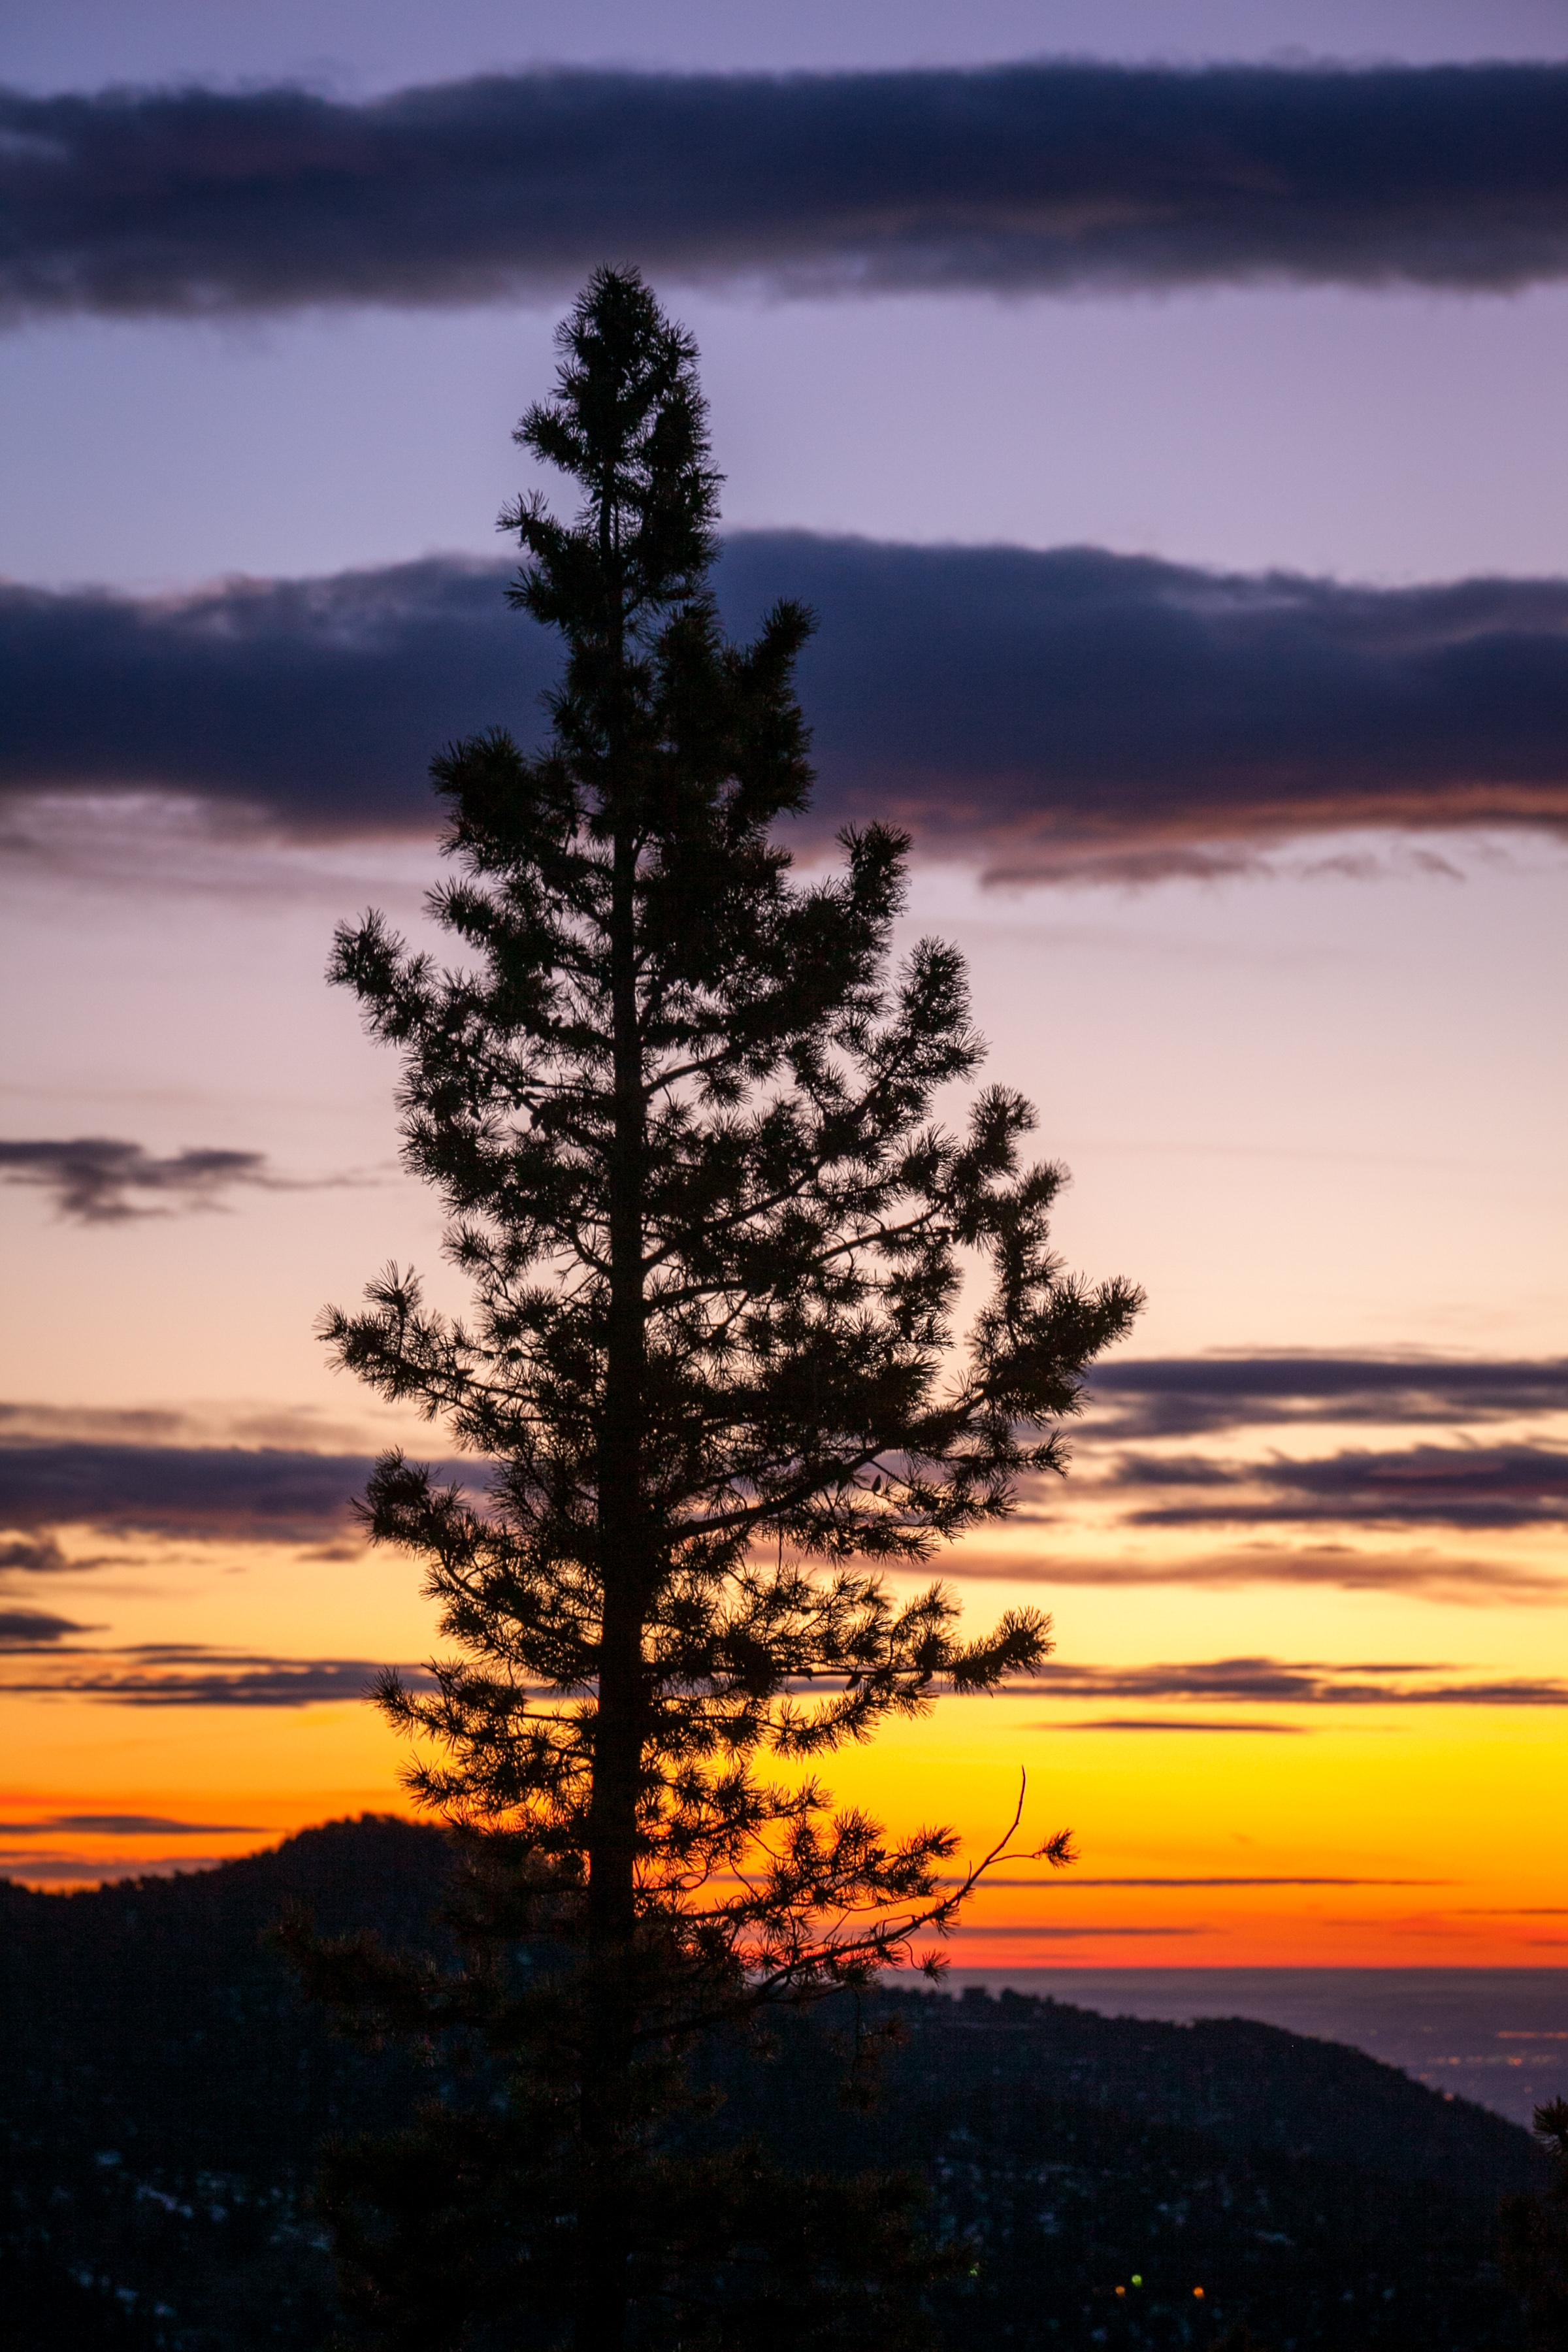 Pine tree-PERSONAL TONED-160212-001.jpg